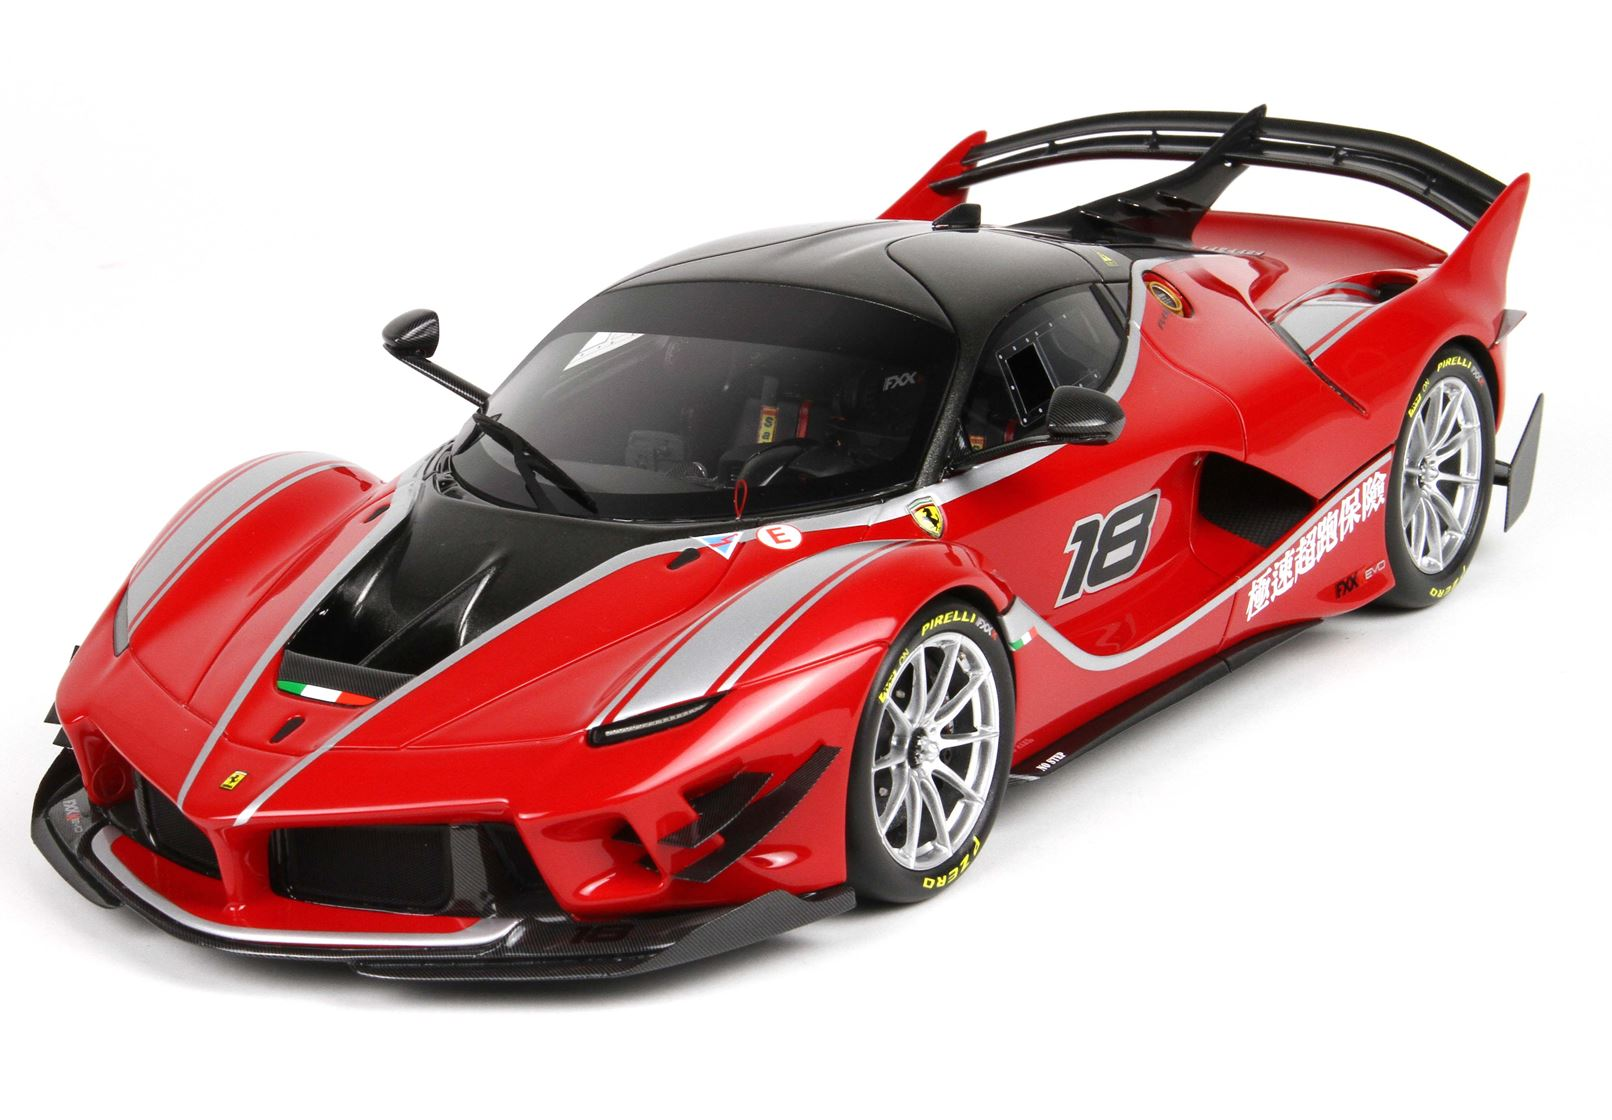 Bbr Ferrari Fxxk Evo Die Cast Rosso Corsa 322 18 1 18 Hansecars Modellautos Hansecars Exklusive Sammlermodelle